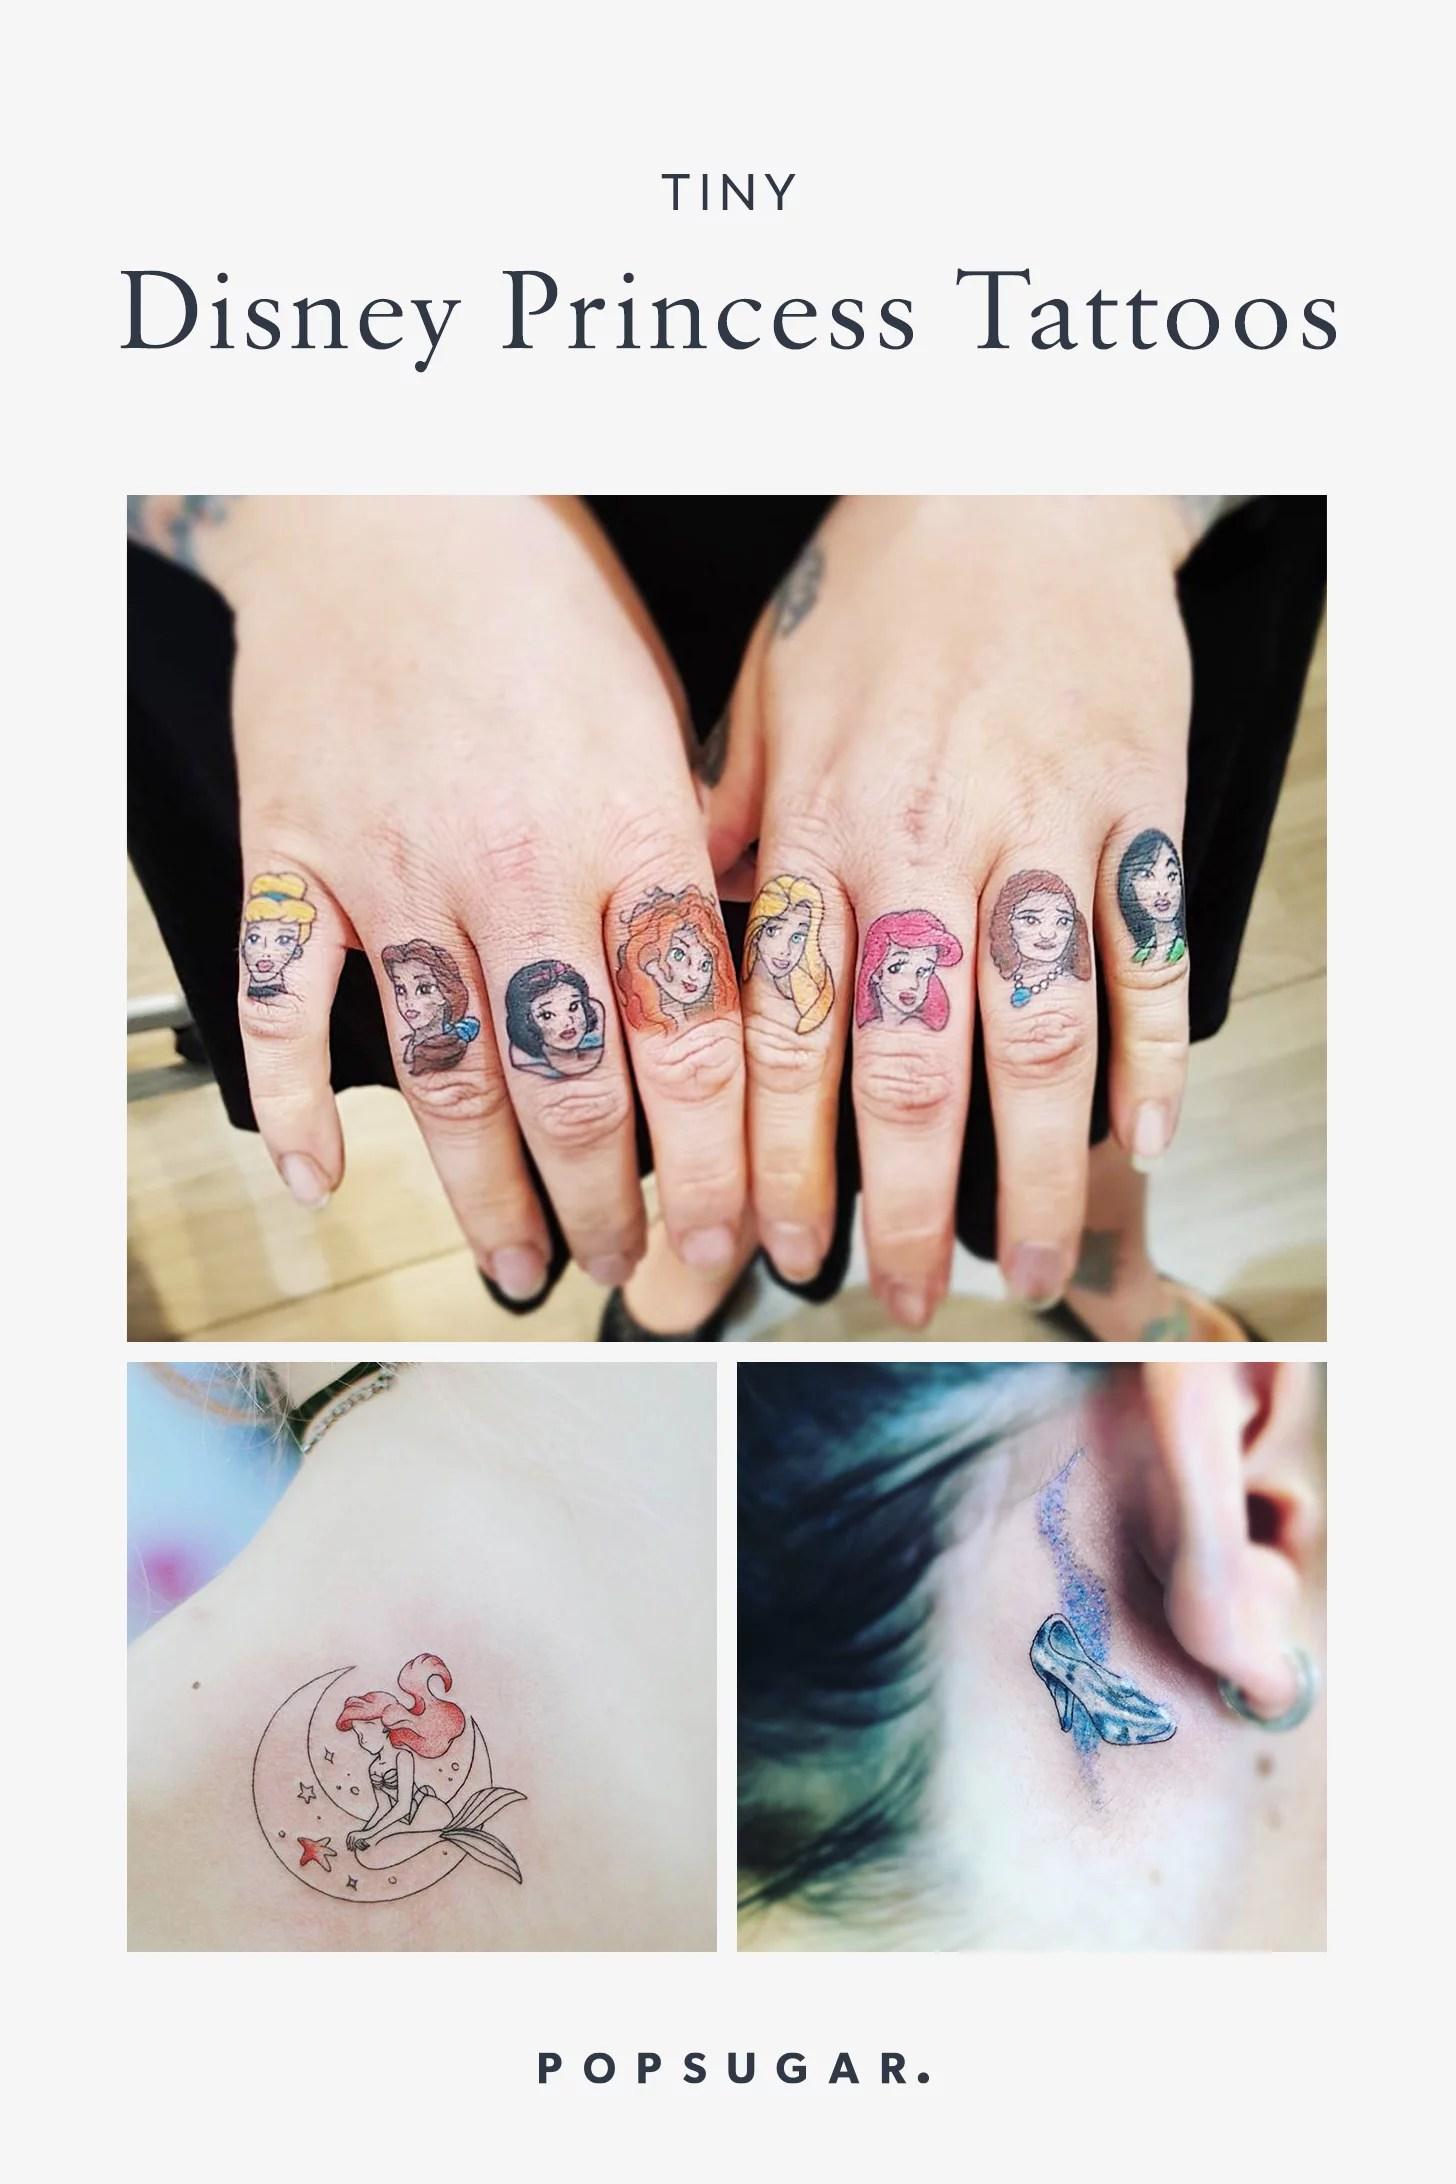 Small Disney Tattoos : small, disney, tattoos, Disney, Princess, Tattoos, POPSUGAR